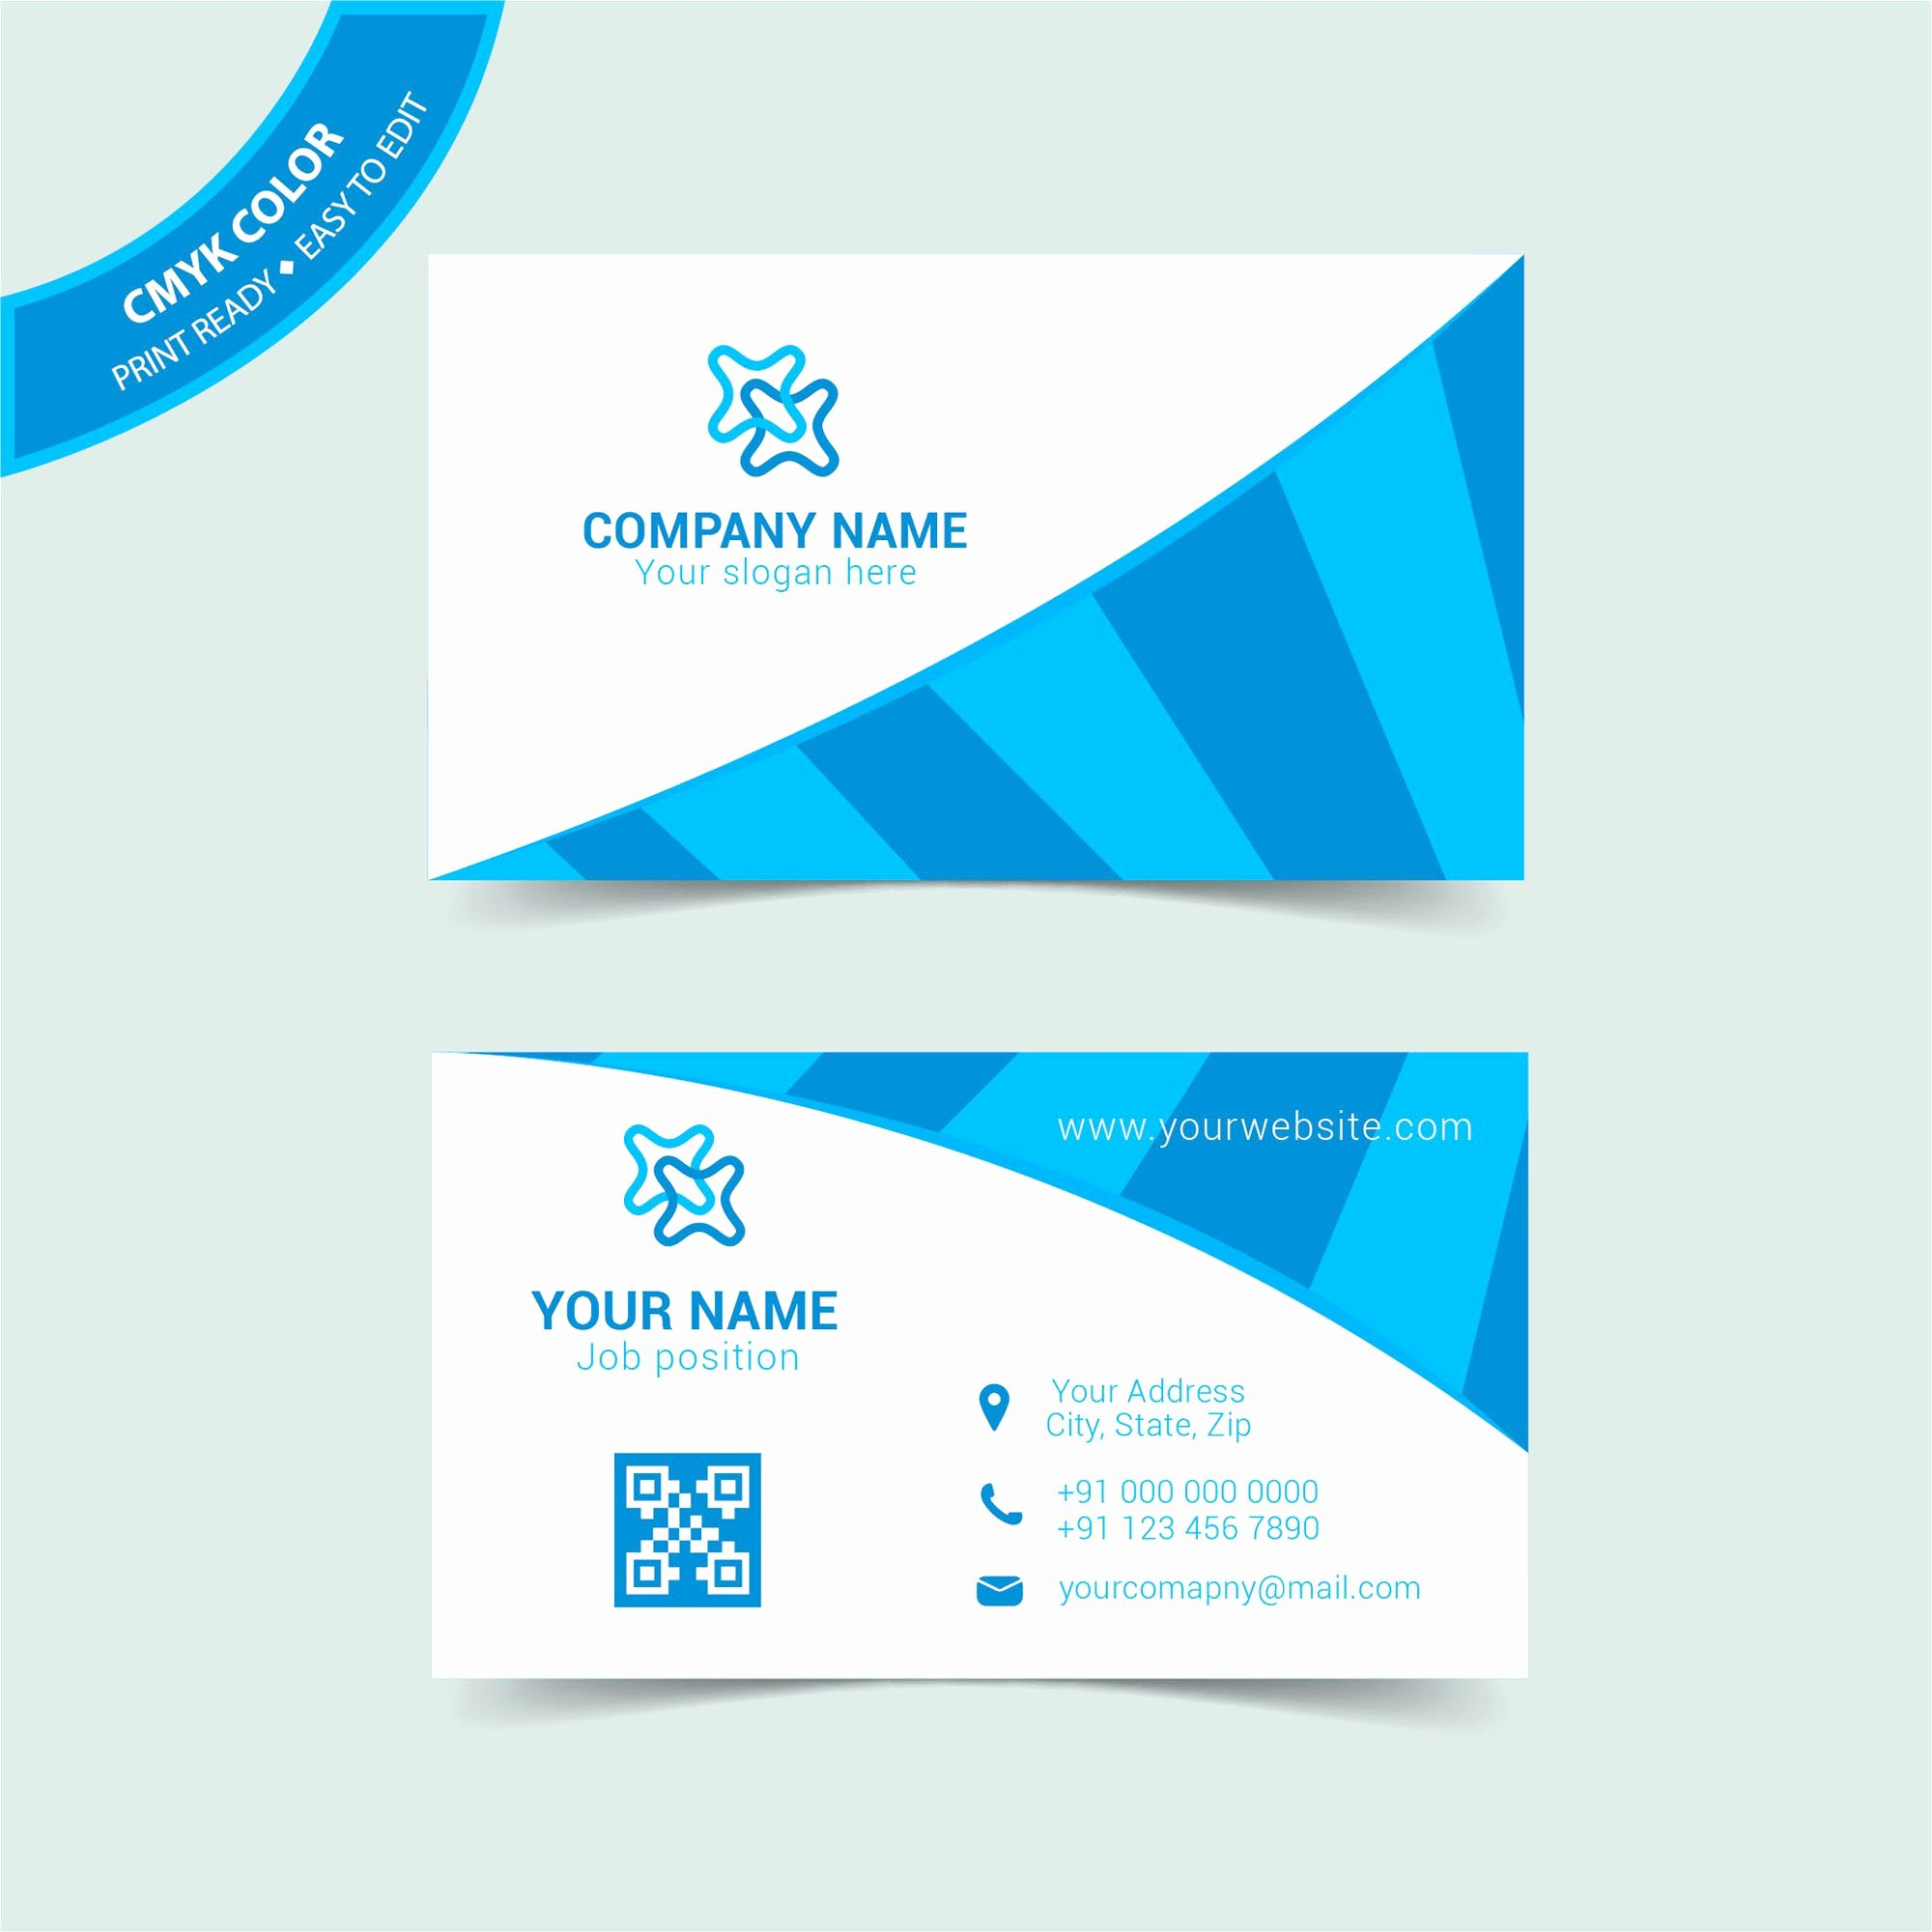 Student Business Cards Template Unique Latest S College Student Business Card Template